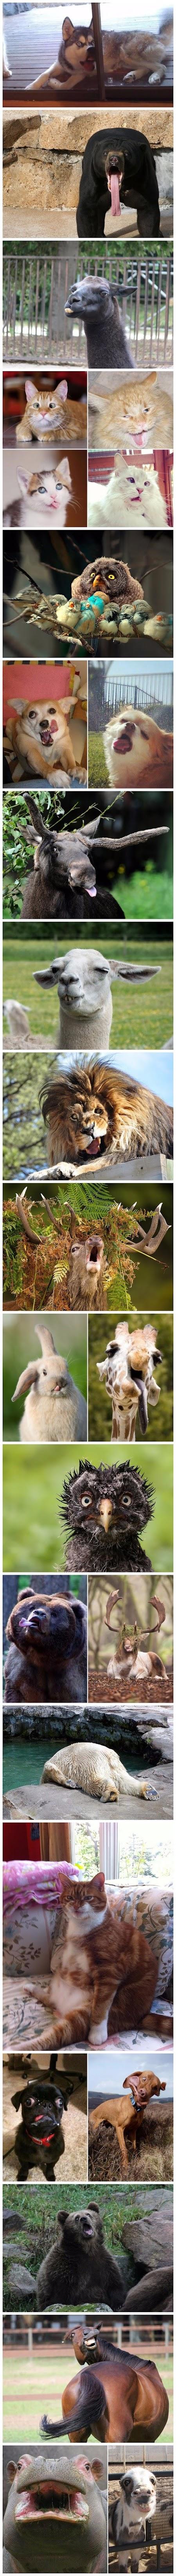 Funny World's Derpiest Animals Joke Picture